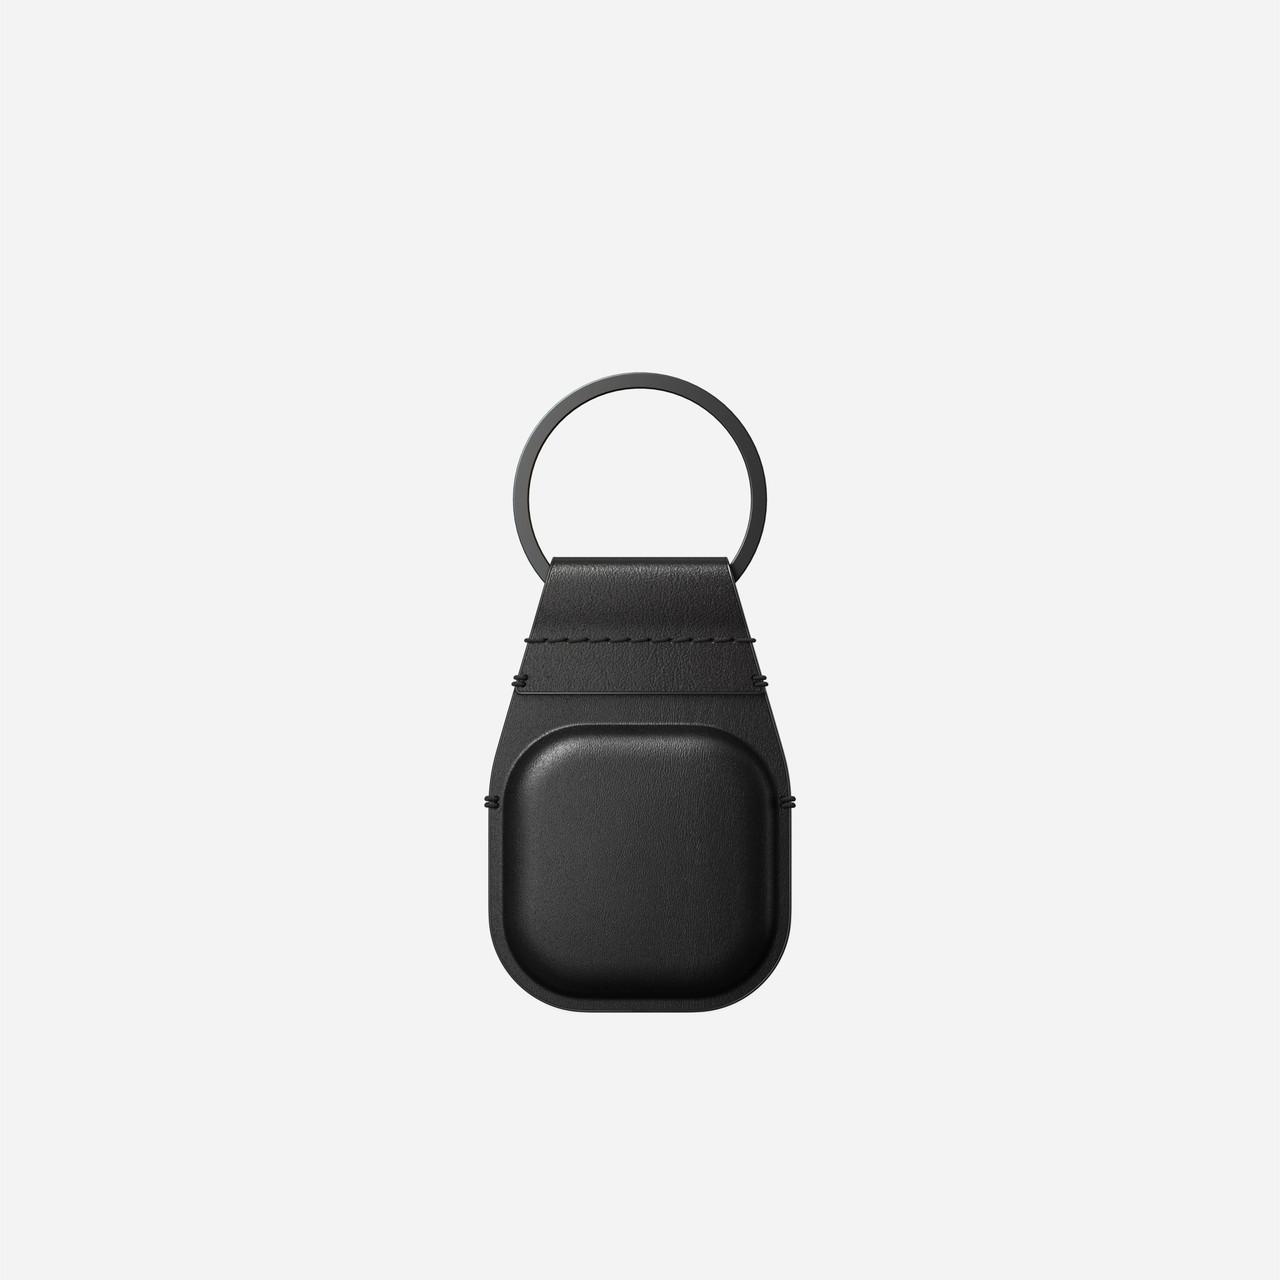 Apple Air tag keychain